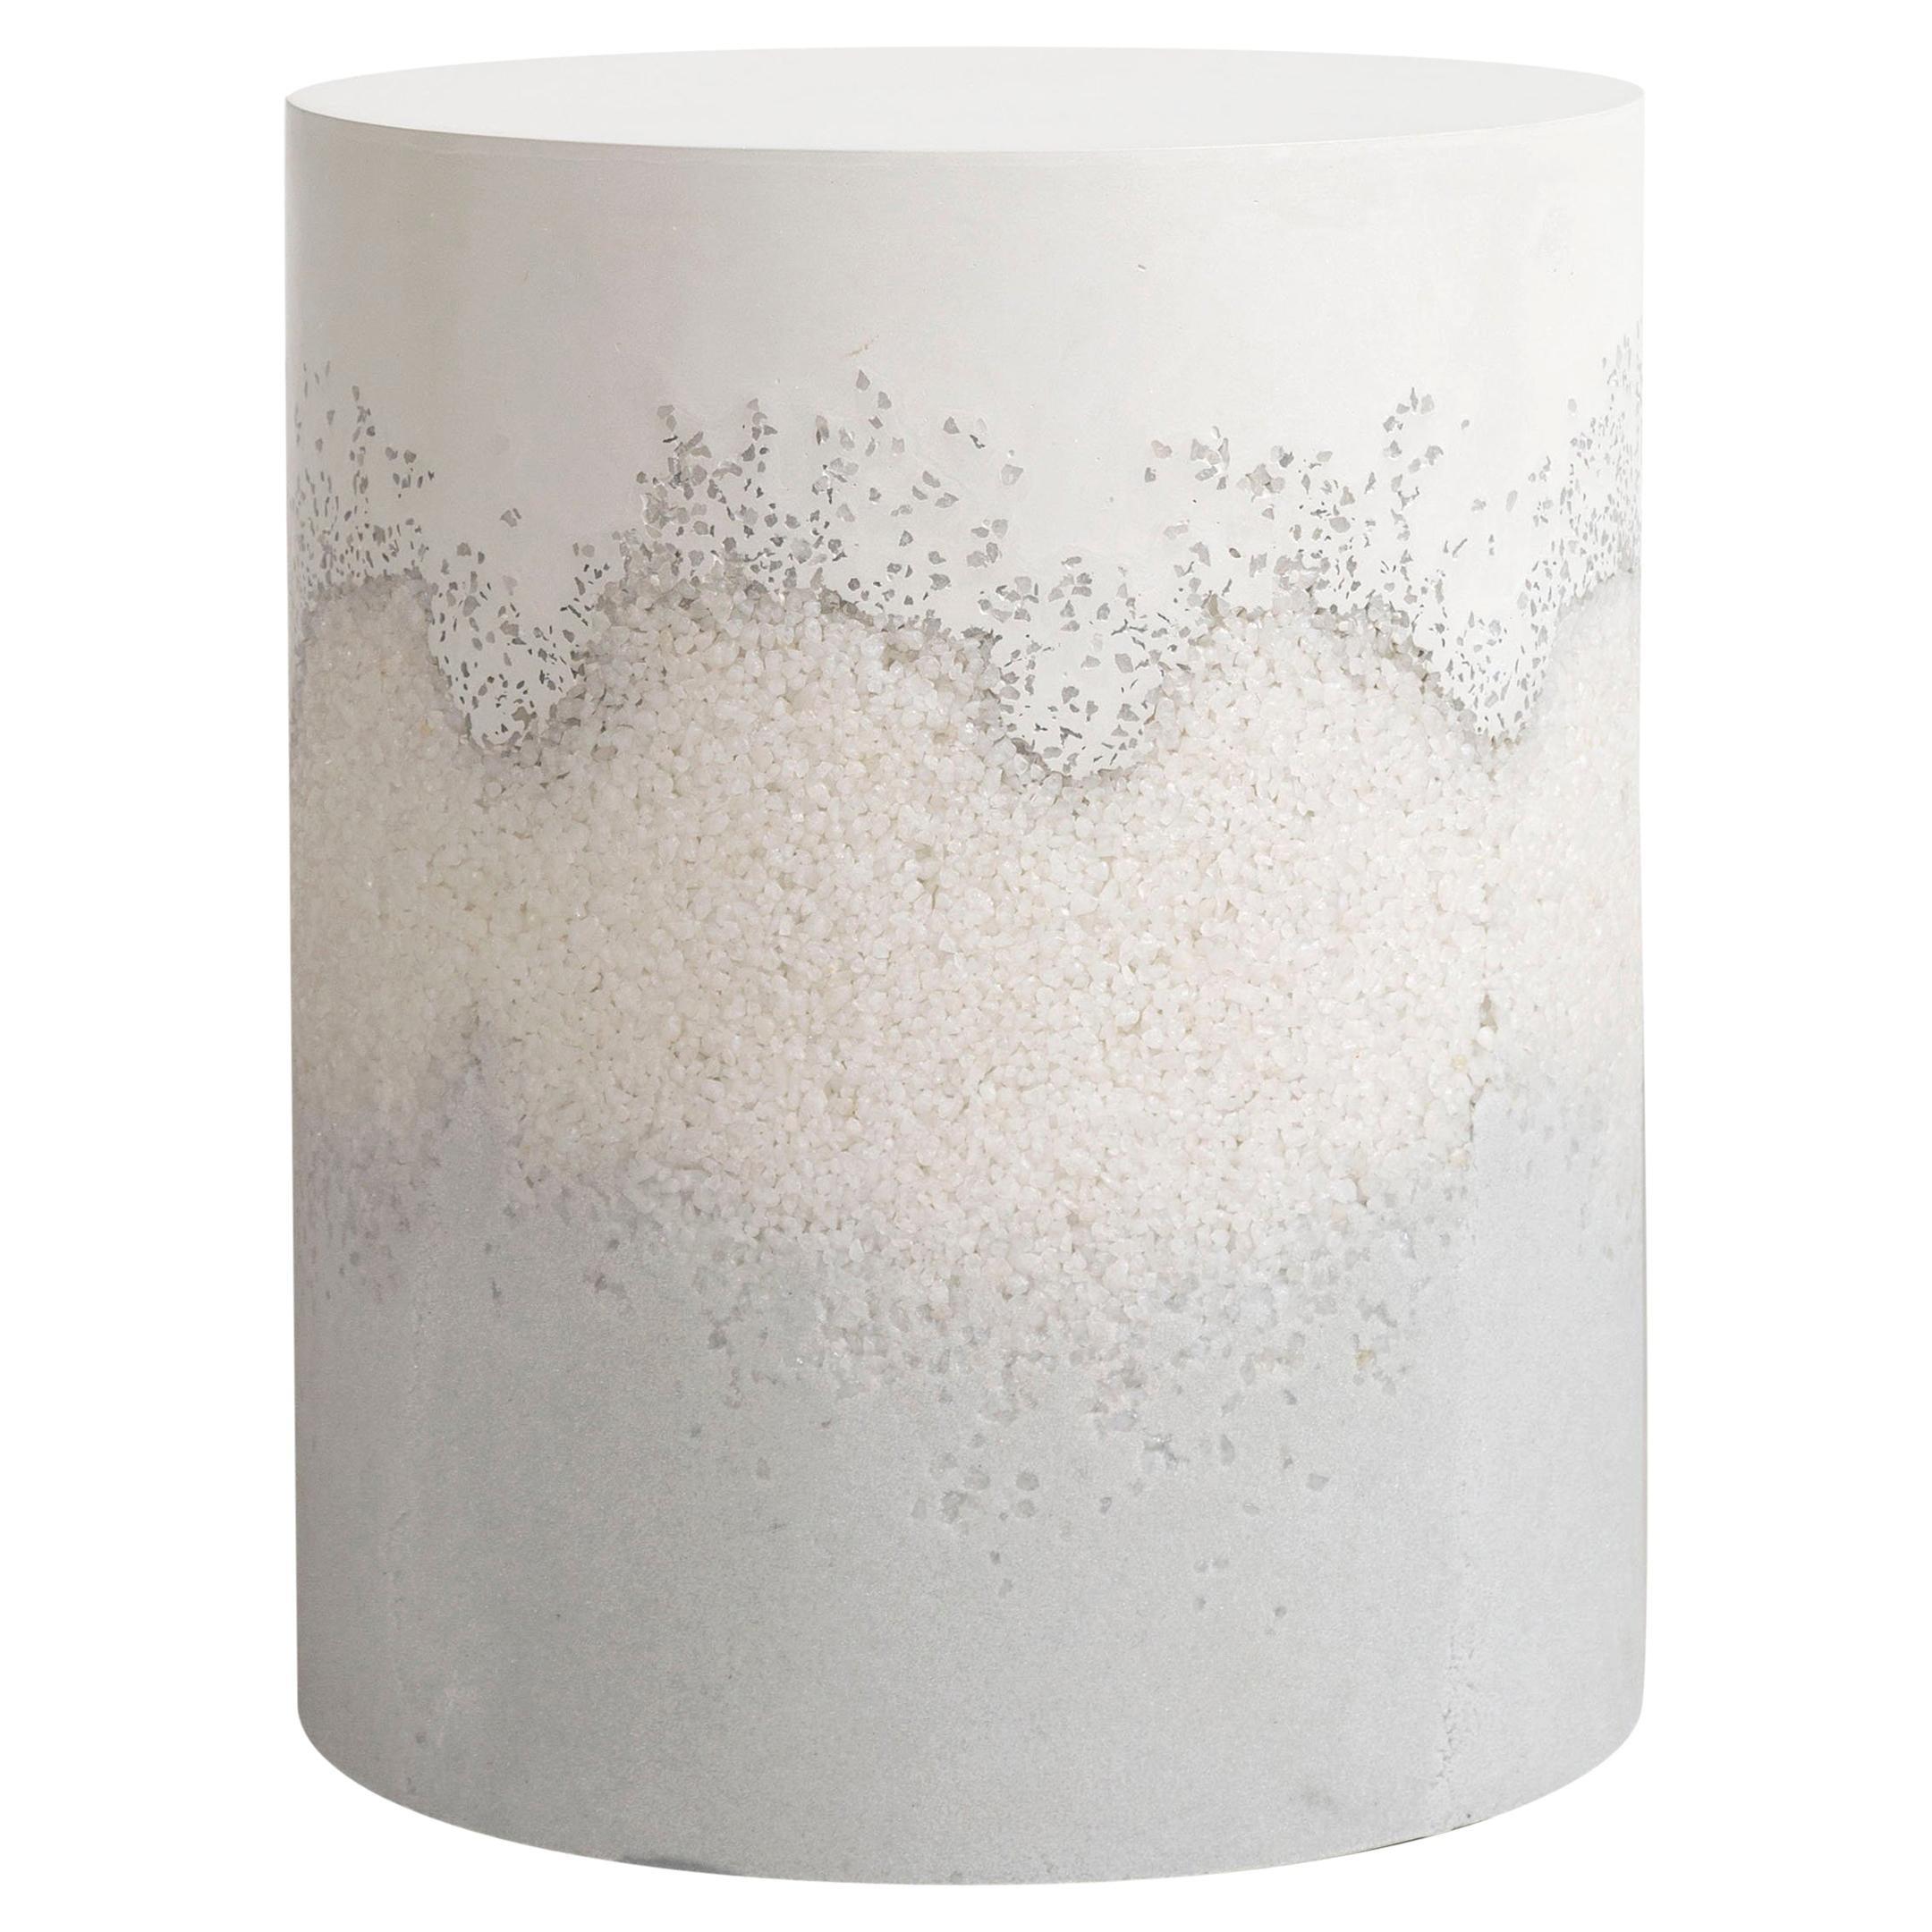 Drum, White Cement, Crystal Quartz and Grey Powdered Glass, Fernando Mastrangelo